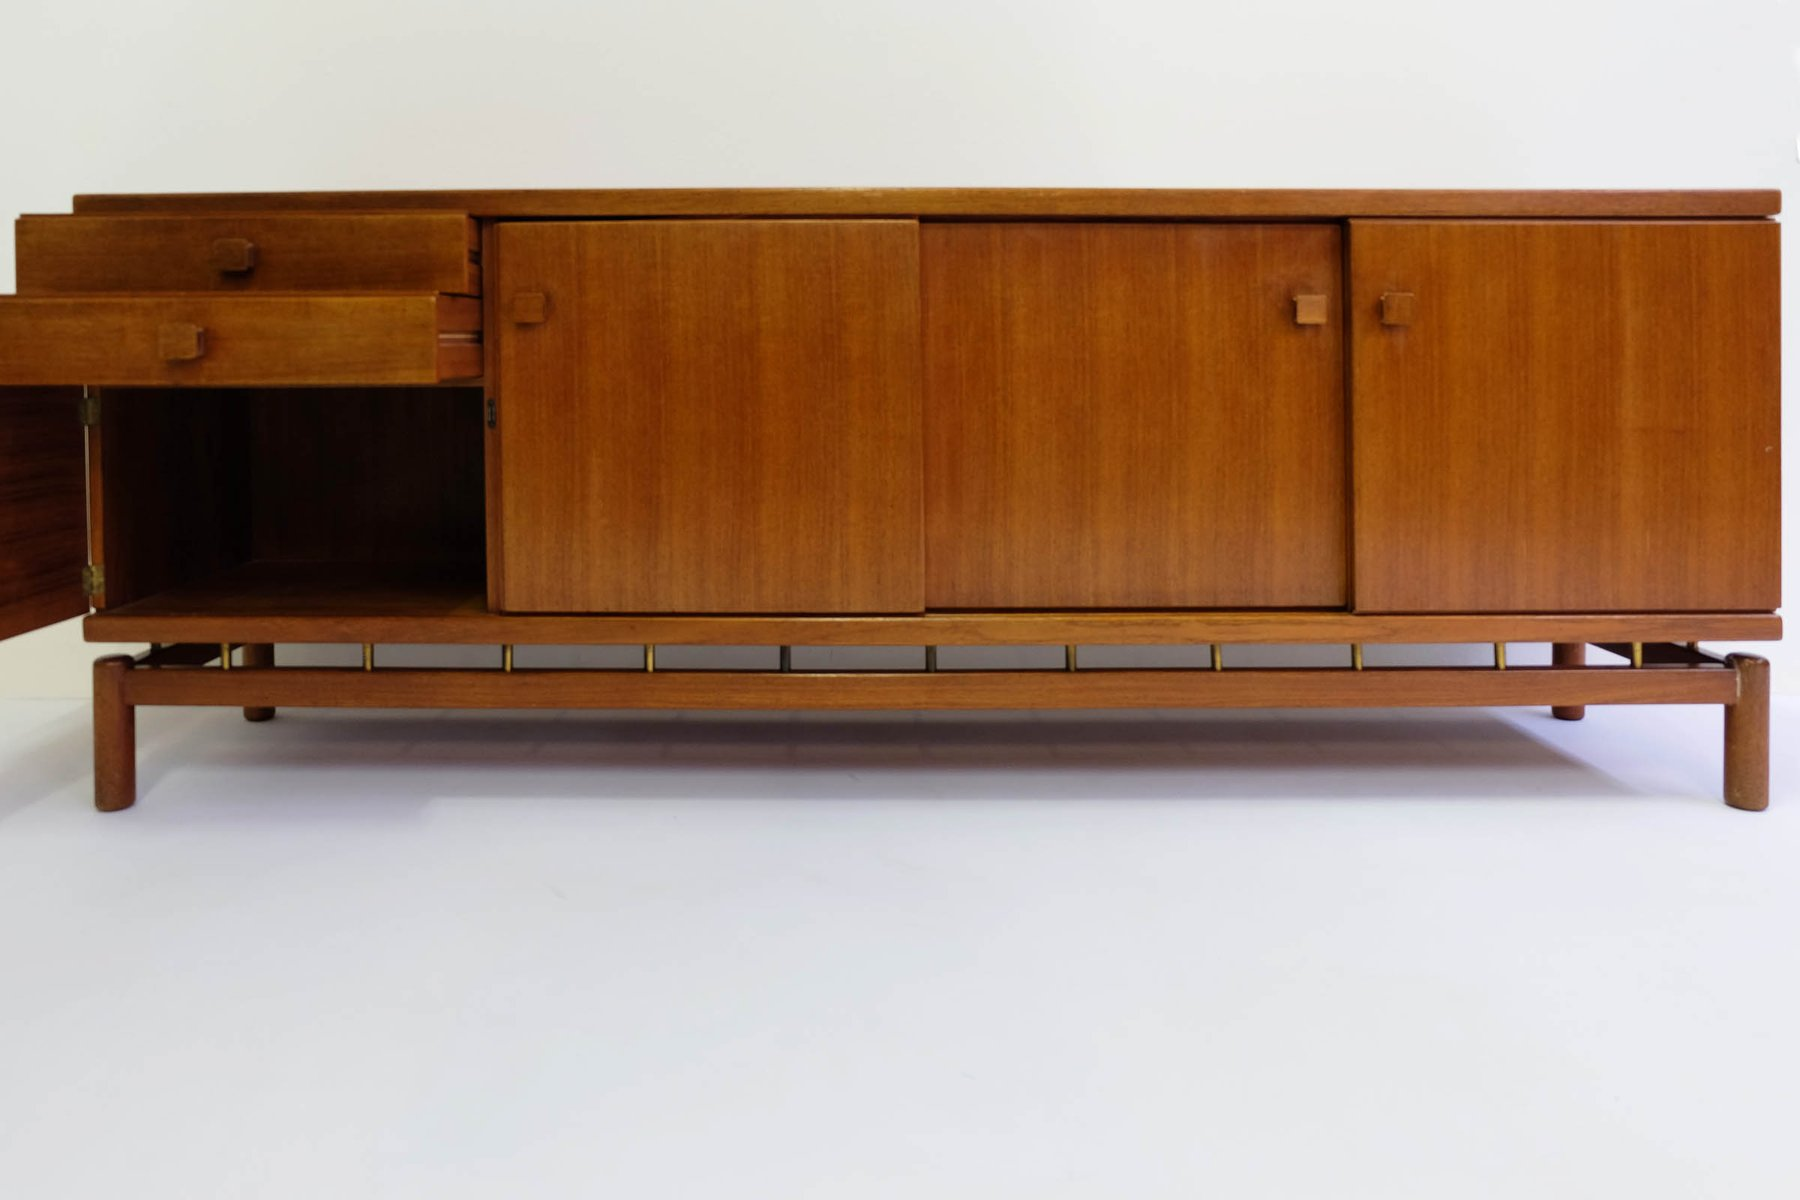 Credenza Per Bicchieri : Credenza in teak di ilmari tapiovaara per la permanente cantù 1957